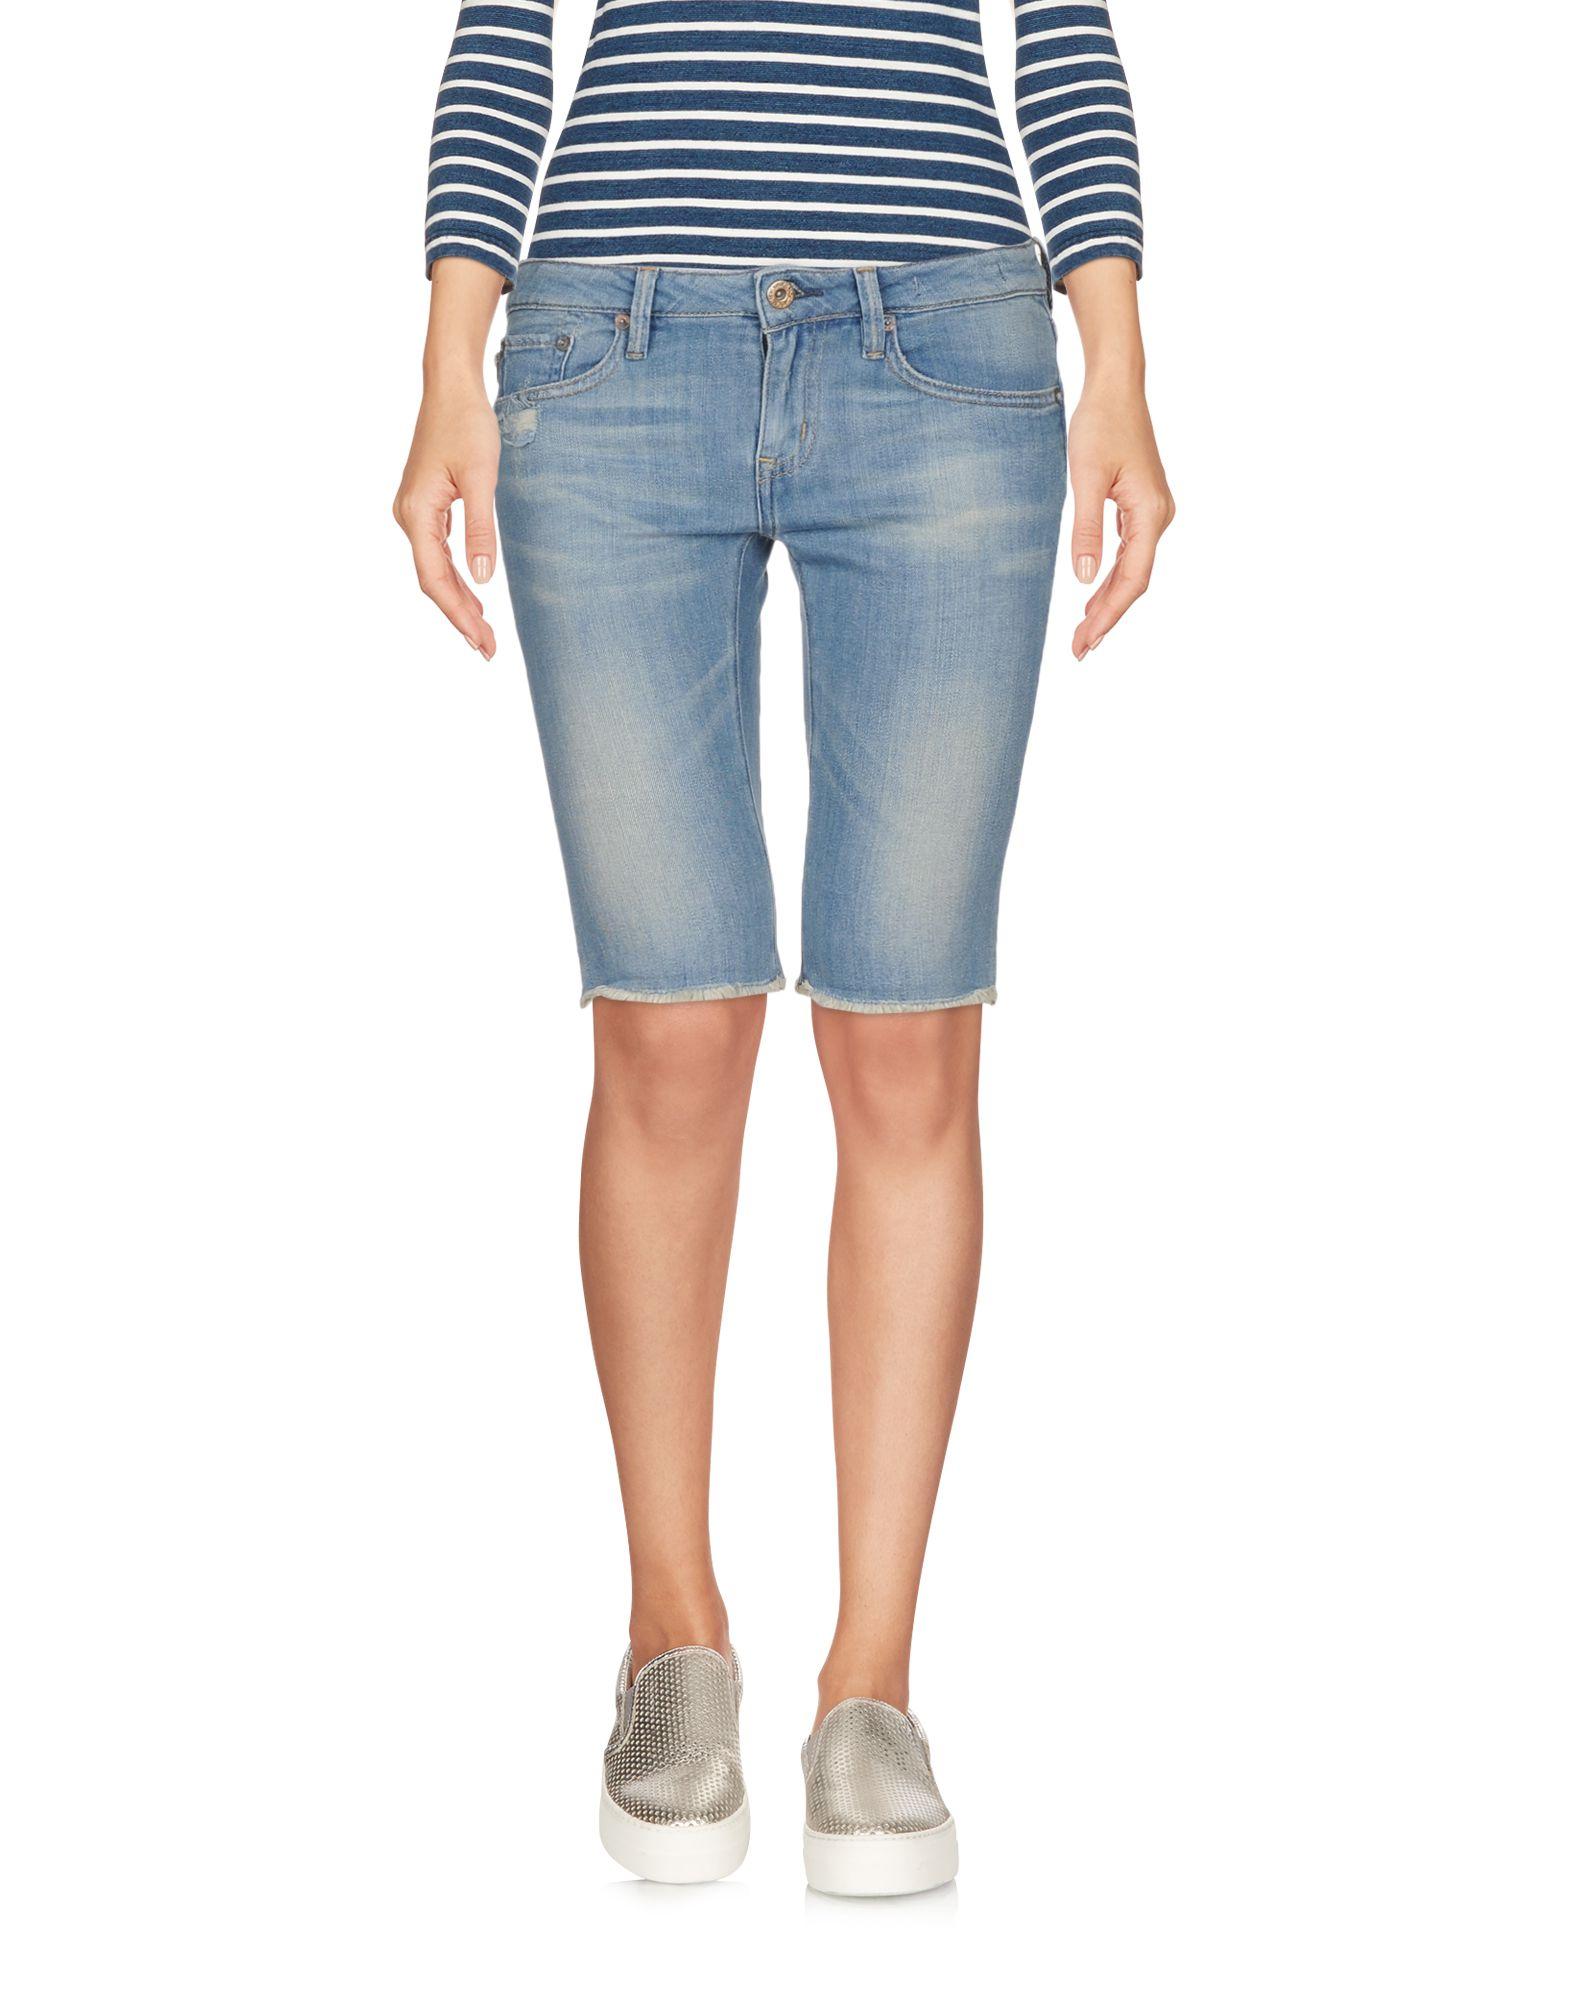 POLO JEANS COMPANY Джинсовые бермуды polo jeans company джинсовые бермуды